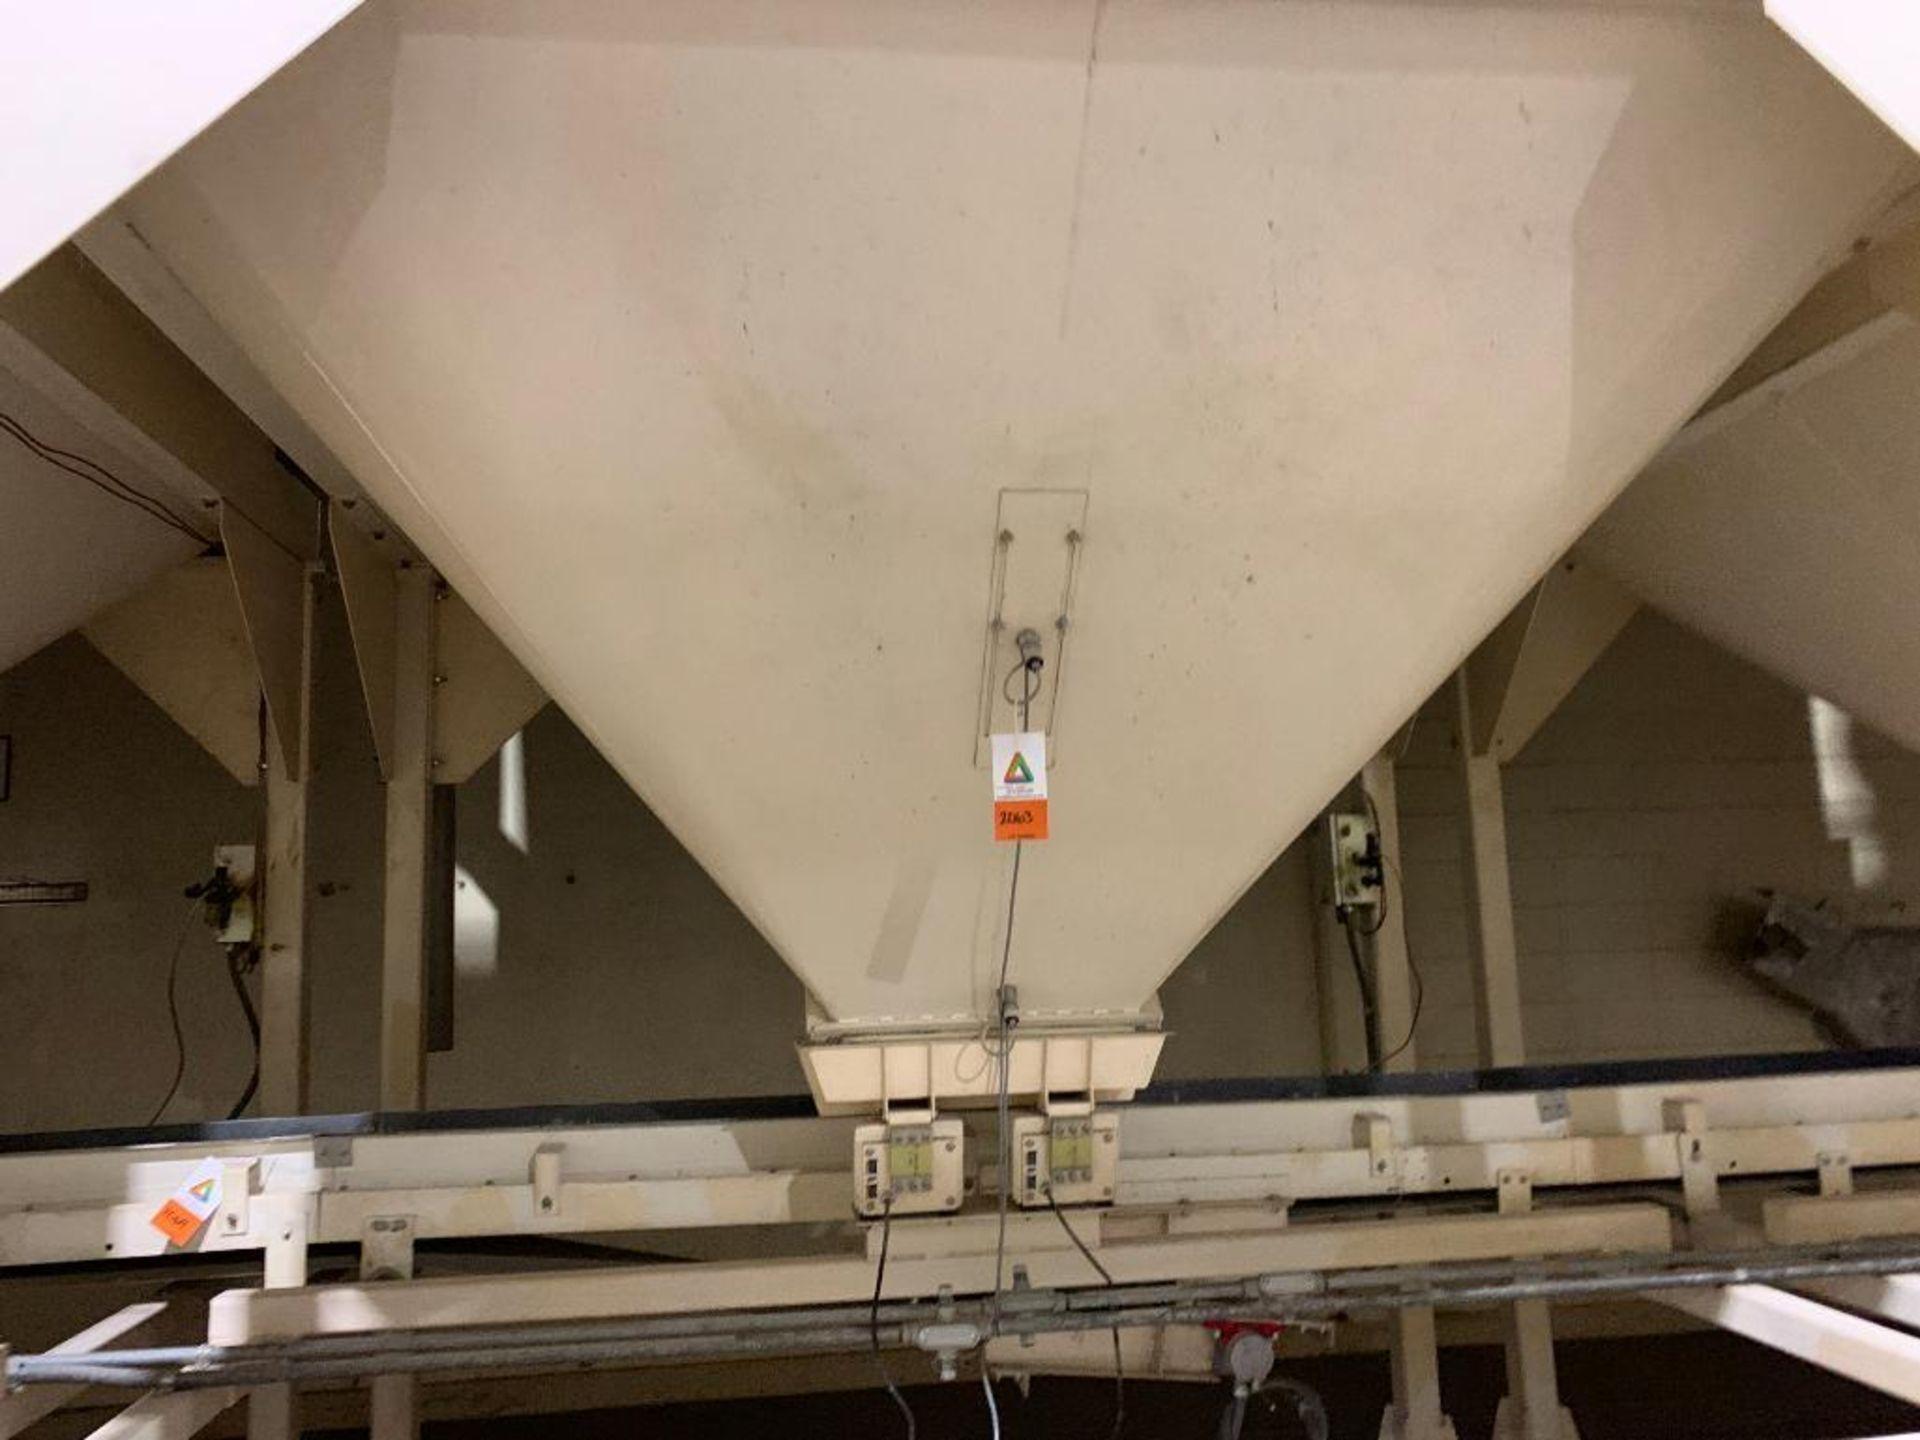 Aseeco mild steel cone bottom bulk storage bin - Image 2 of 27